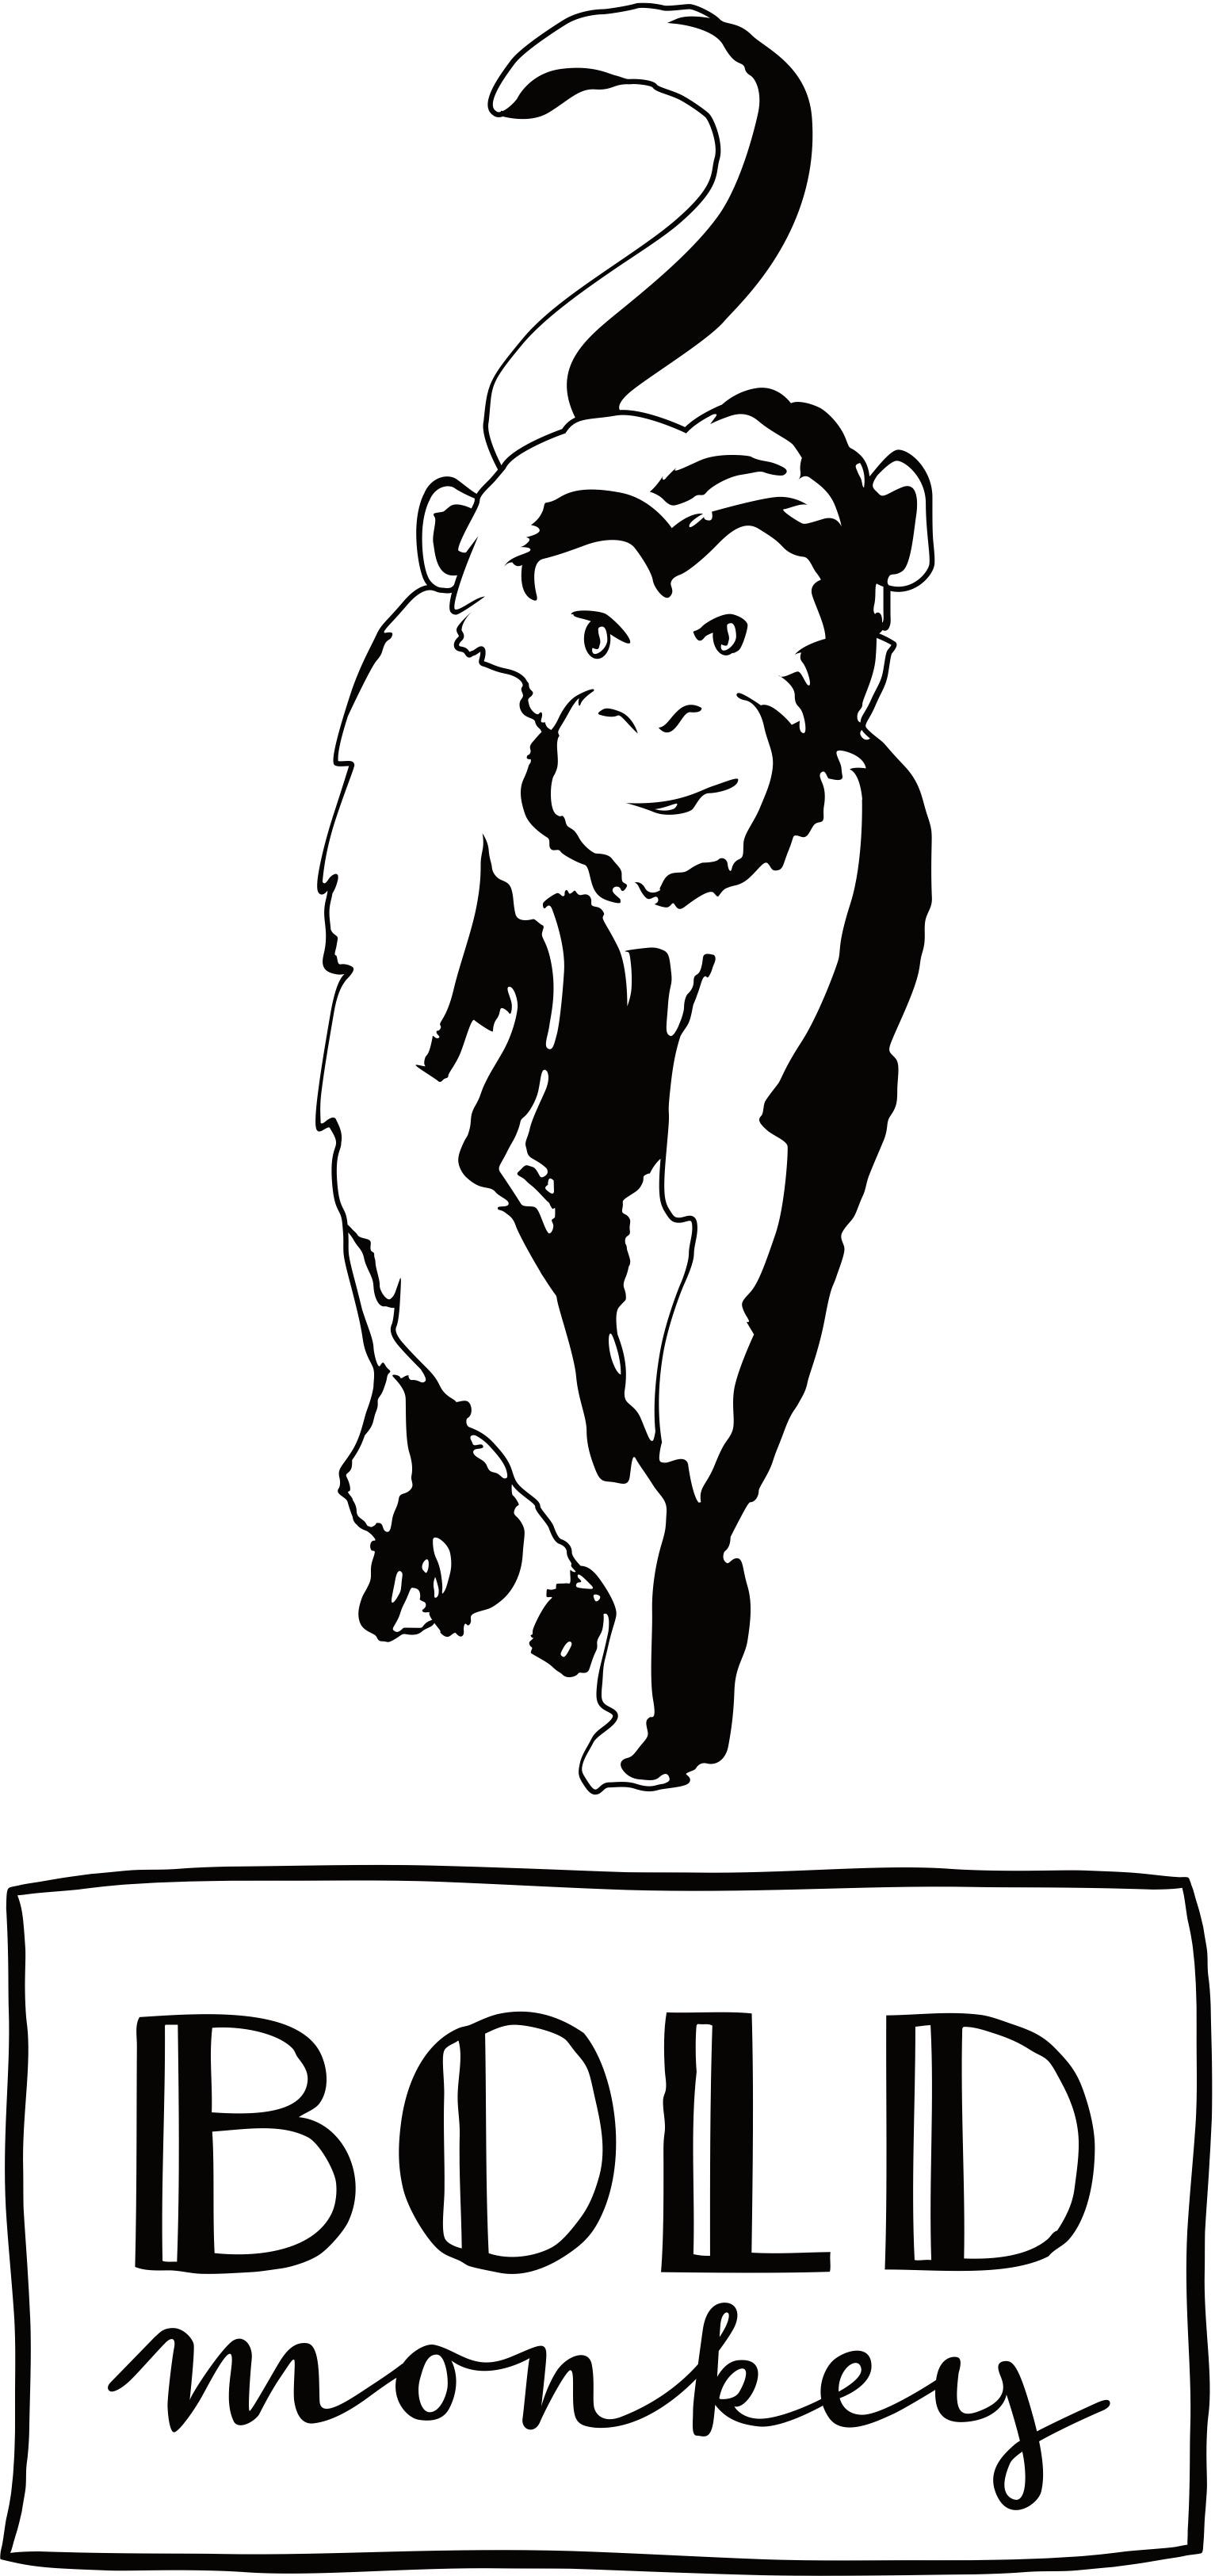 Bold Monkey i am not a macaron barkruk velvet roze gouden poten vooraanzicht